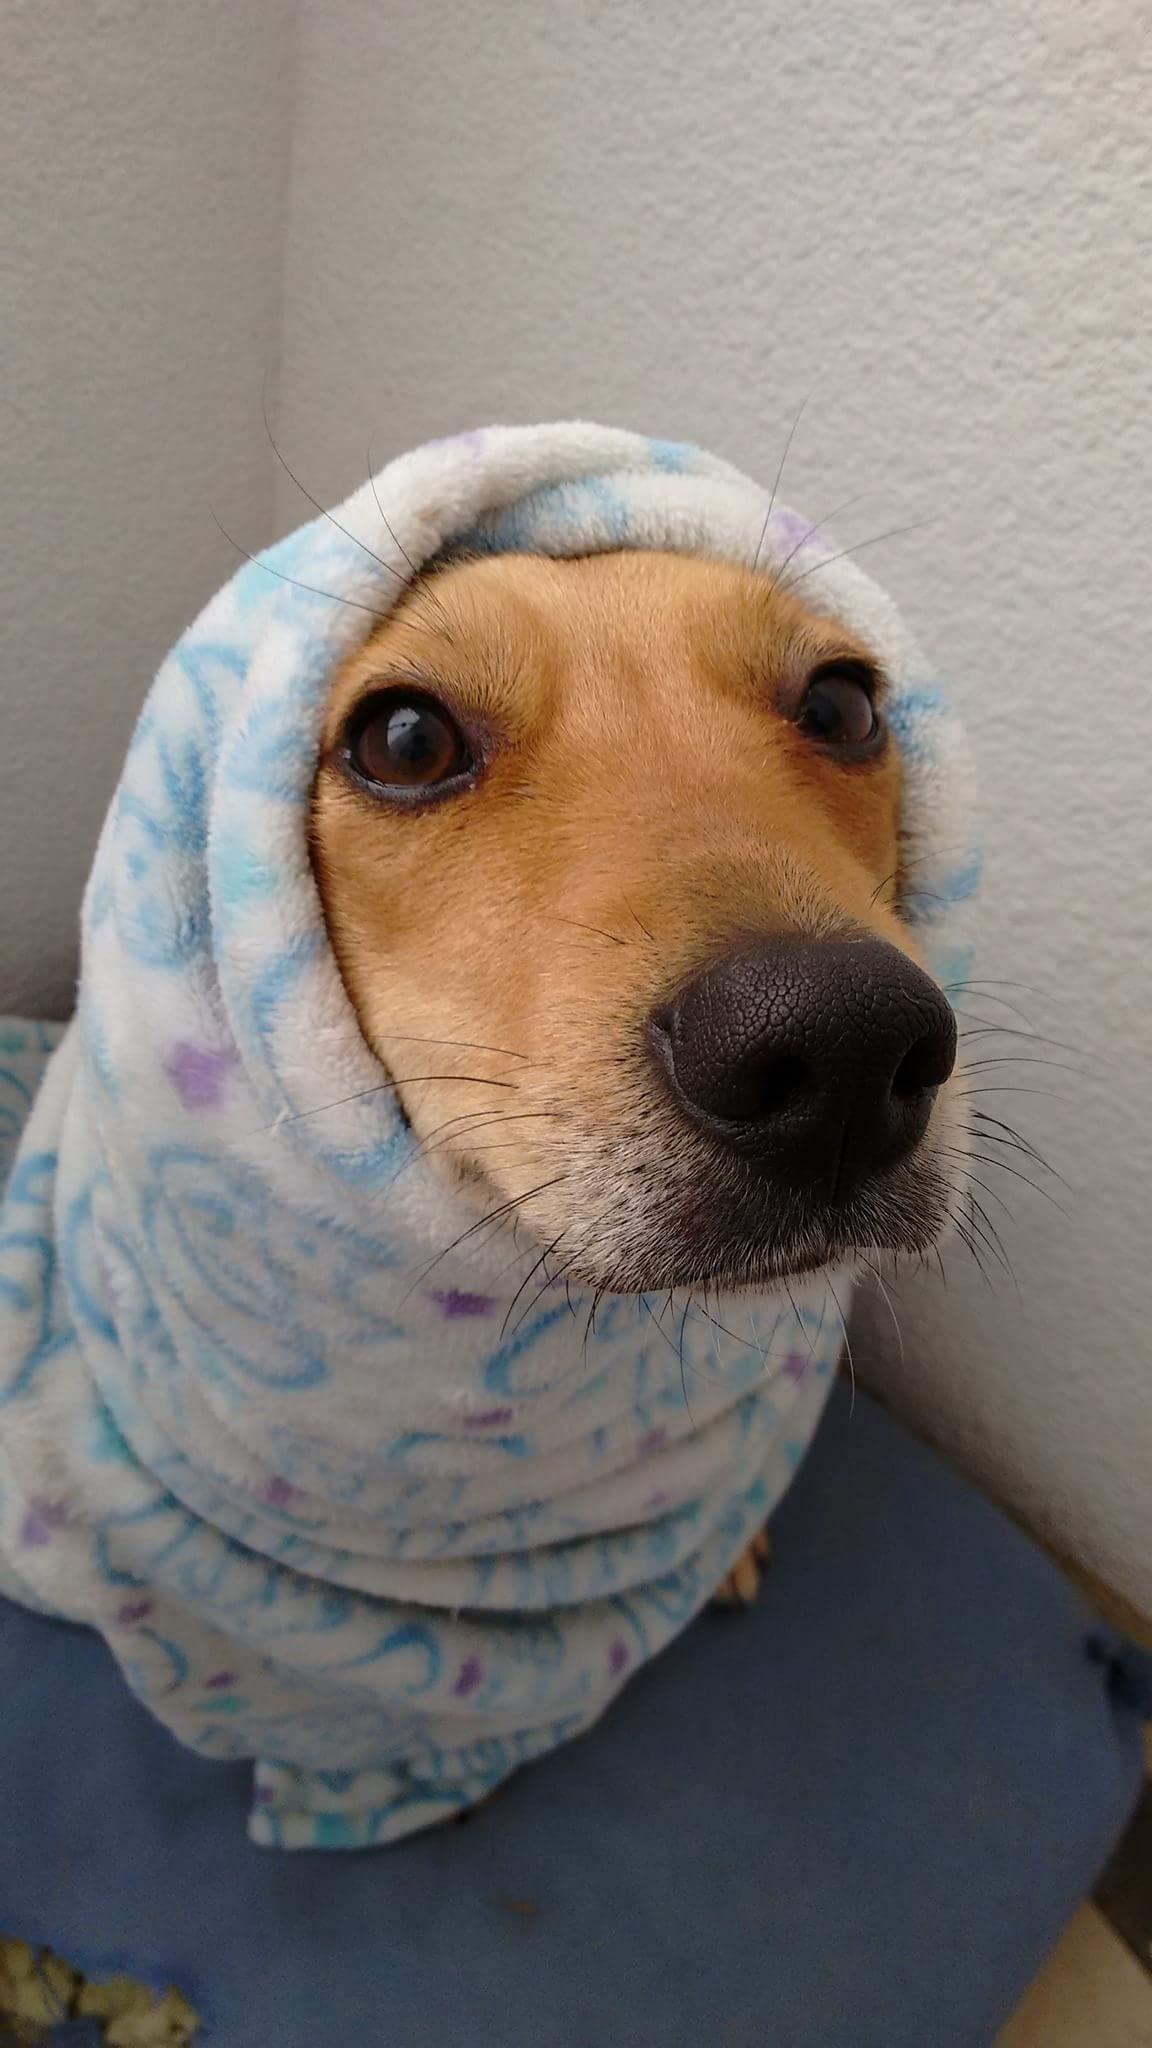 Es Hora De Ir A Misa Vamos A Misa A Rezar Por Mi Cojin Mordido La Lara La La Expertoanimal Mundoanimal Reinoanimal Animales Naturalez Pets Dog Cat Dogs